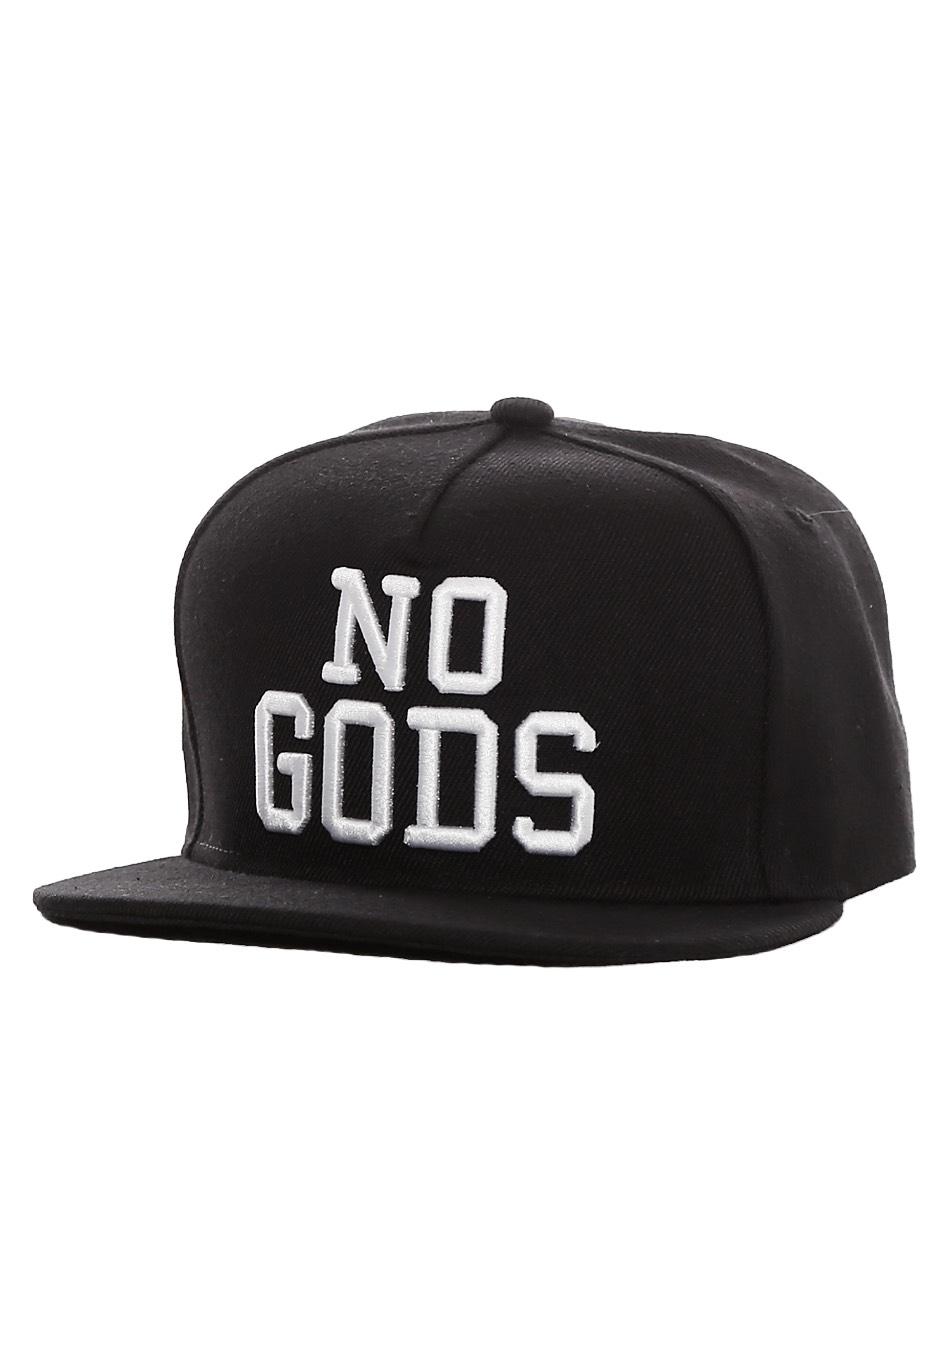 Black Craft Cult - No Gods - Cap - Streetwear Shop - Impericon.com Worldwide 5da4a0d72f0